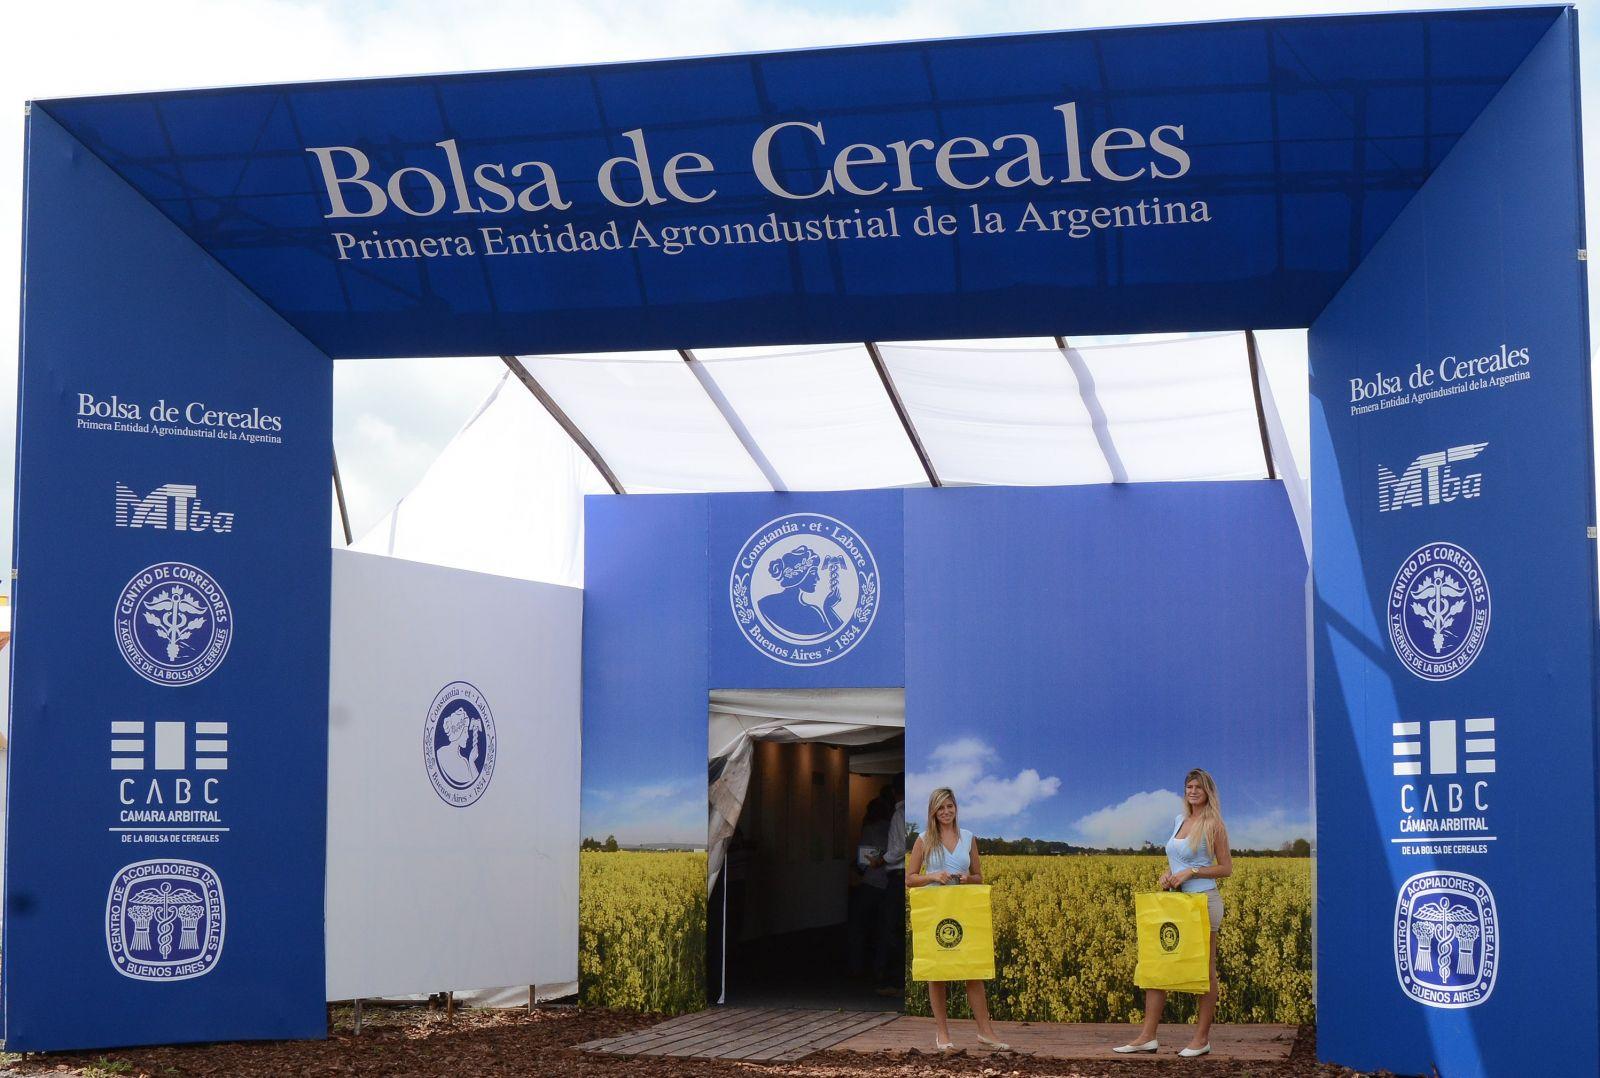 http://www.bolsadecereales.org/imagenes/userfiles/images/Expoagro%202015-04-03-006(1).jpg